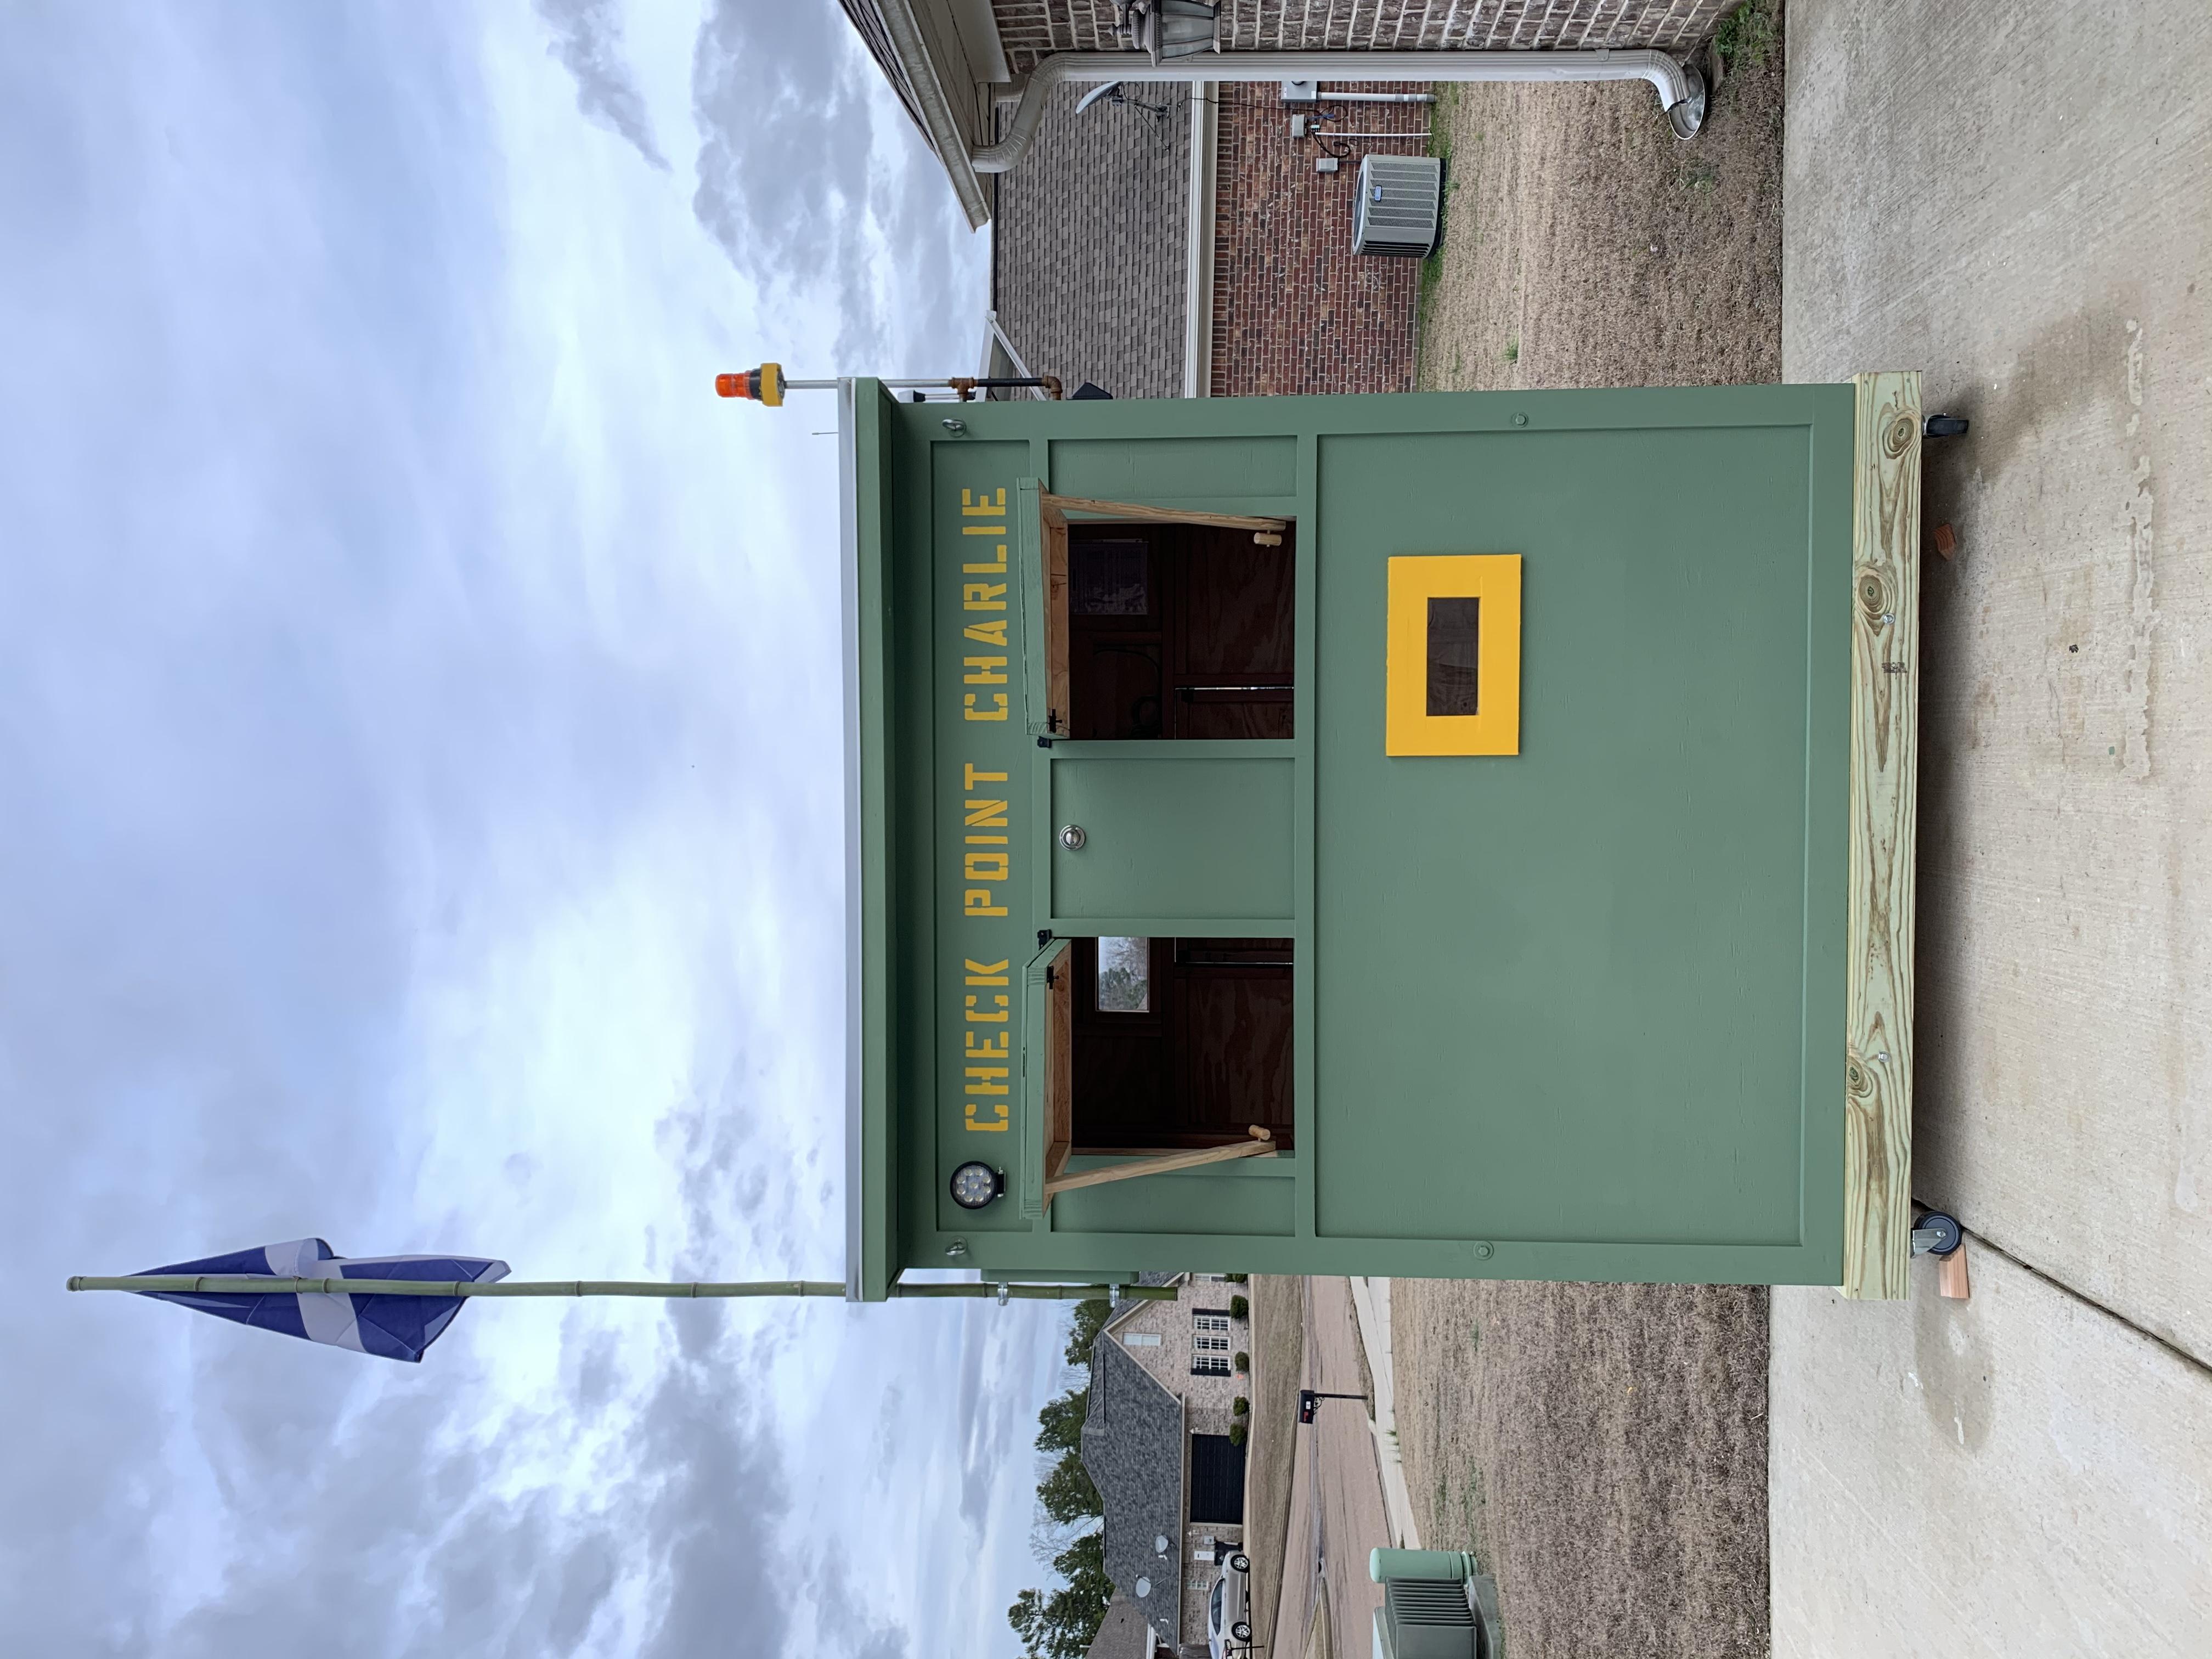 Off Grid Shelter- Shoot House- Observation Tower-73bef50a-92f2-4814-ba6e-70174b4e1343.jpeg